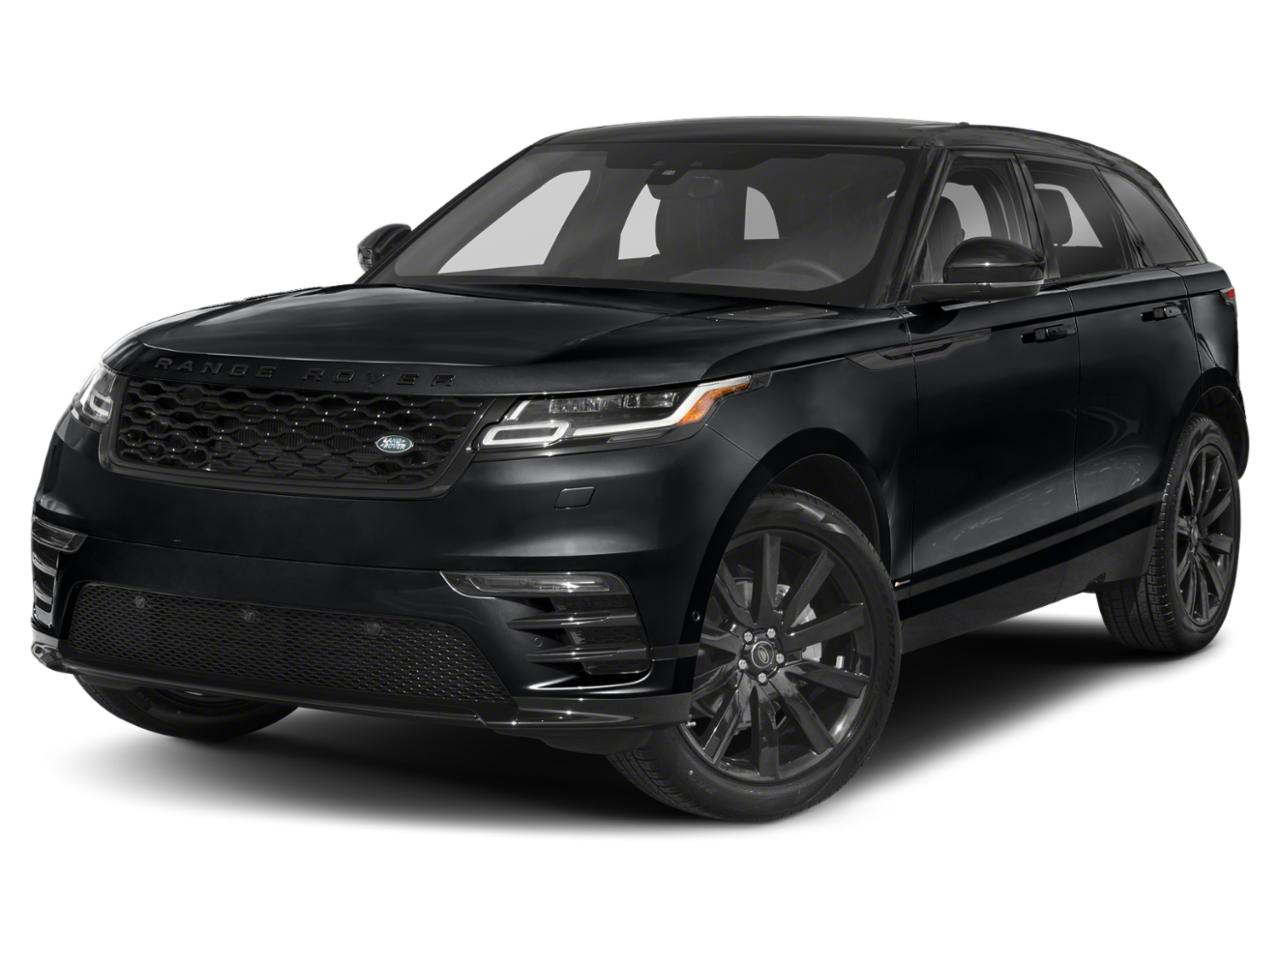 2020 Land Rover Range Rover Velar Vehicle Photo in Tucson, AZ 85705